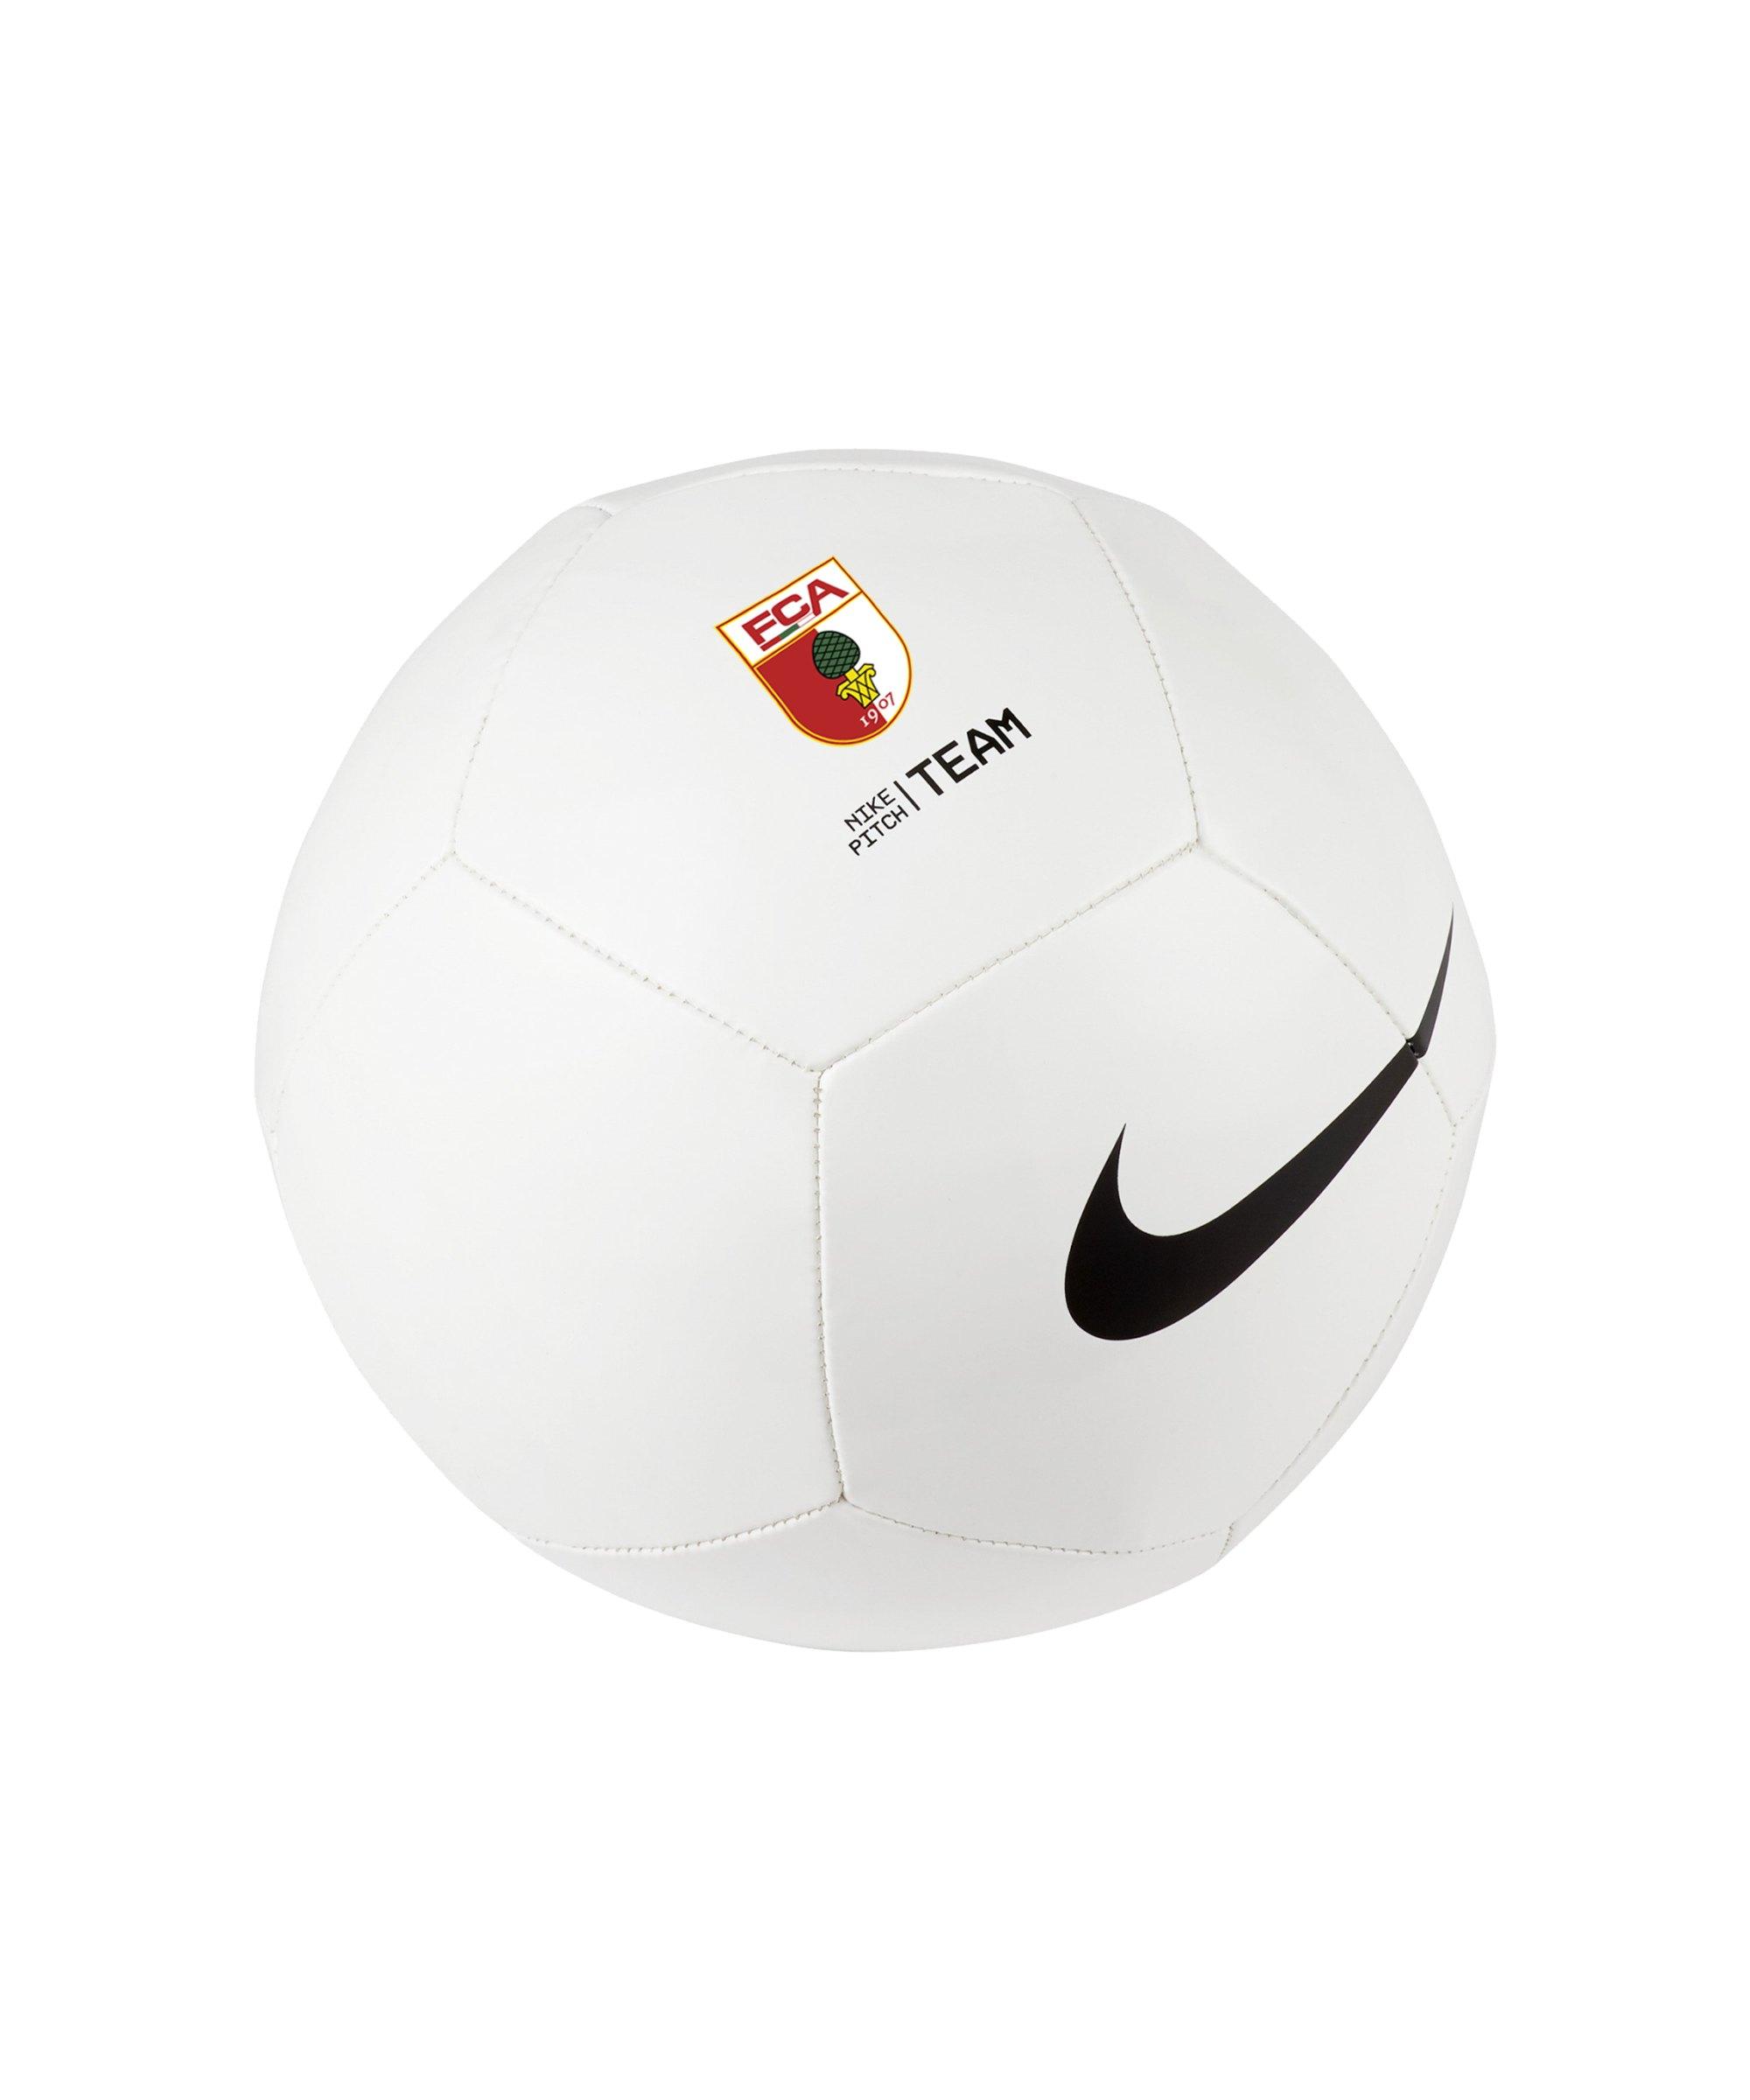 Nike FC Augsburg Trainingsball Weiss F100 - weiss